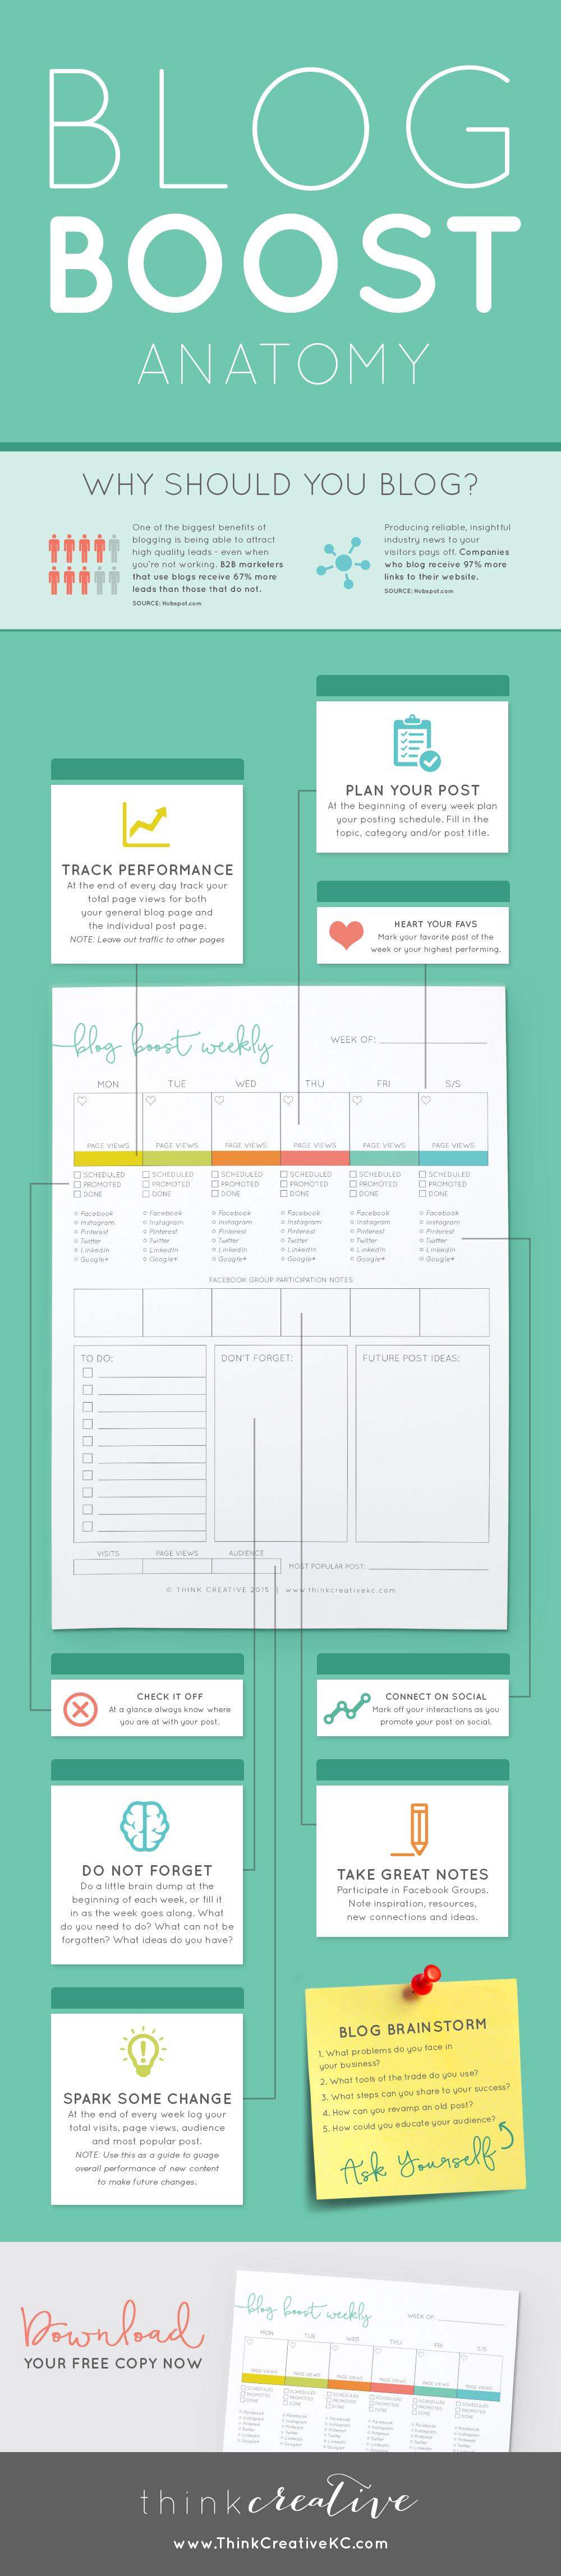 Blog Boost Anatomy (BONUS: Blog Planning & Analysis Printable)